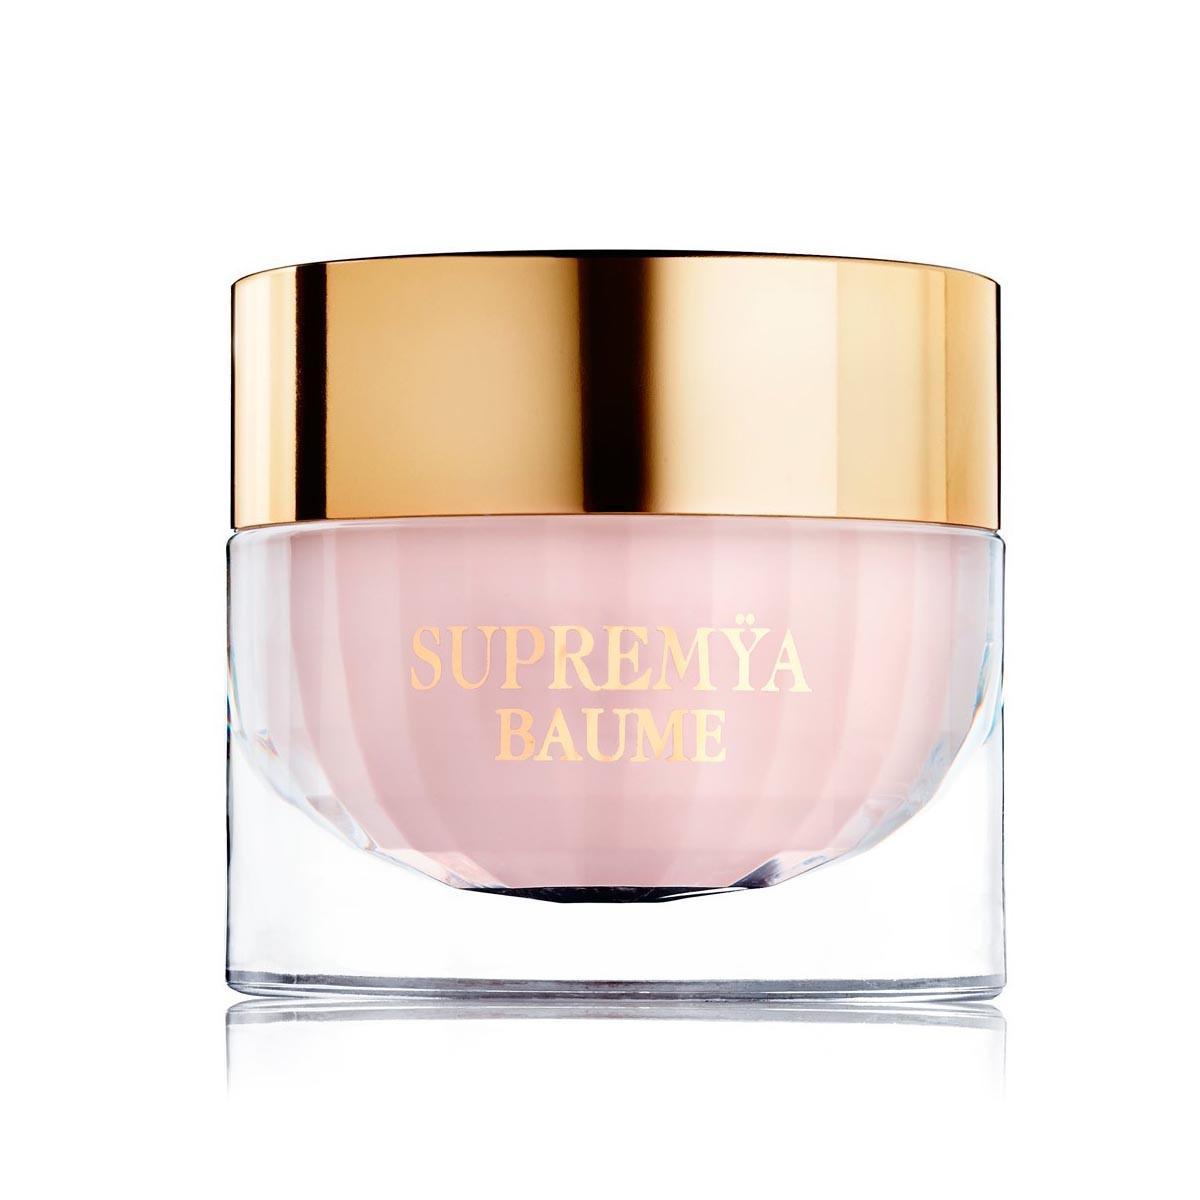 Sisley Nuit Fragrances Supremya Baume La Nuit Sisley Antiage Cream 50ml, Cosmética facial e3337c